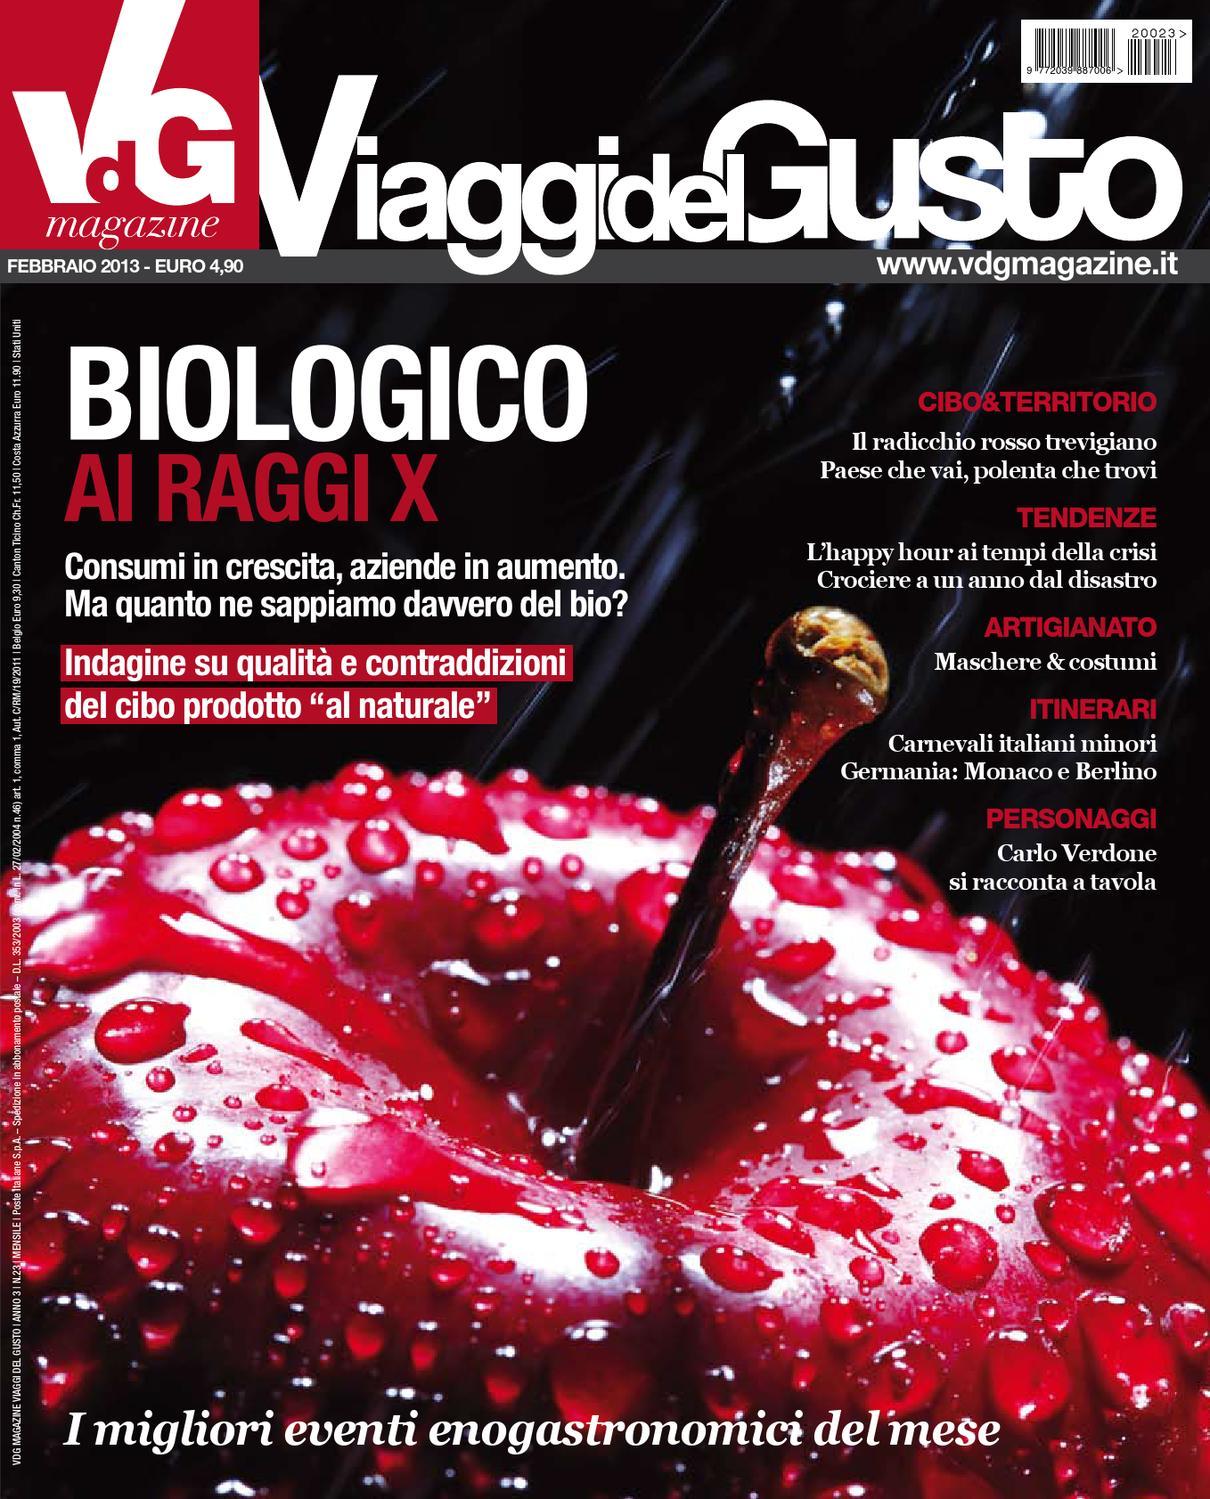 VdG Magazine Viaggi del Gusto by vdgmagazine - issuu e1358fe4953